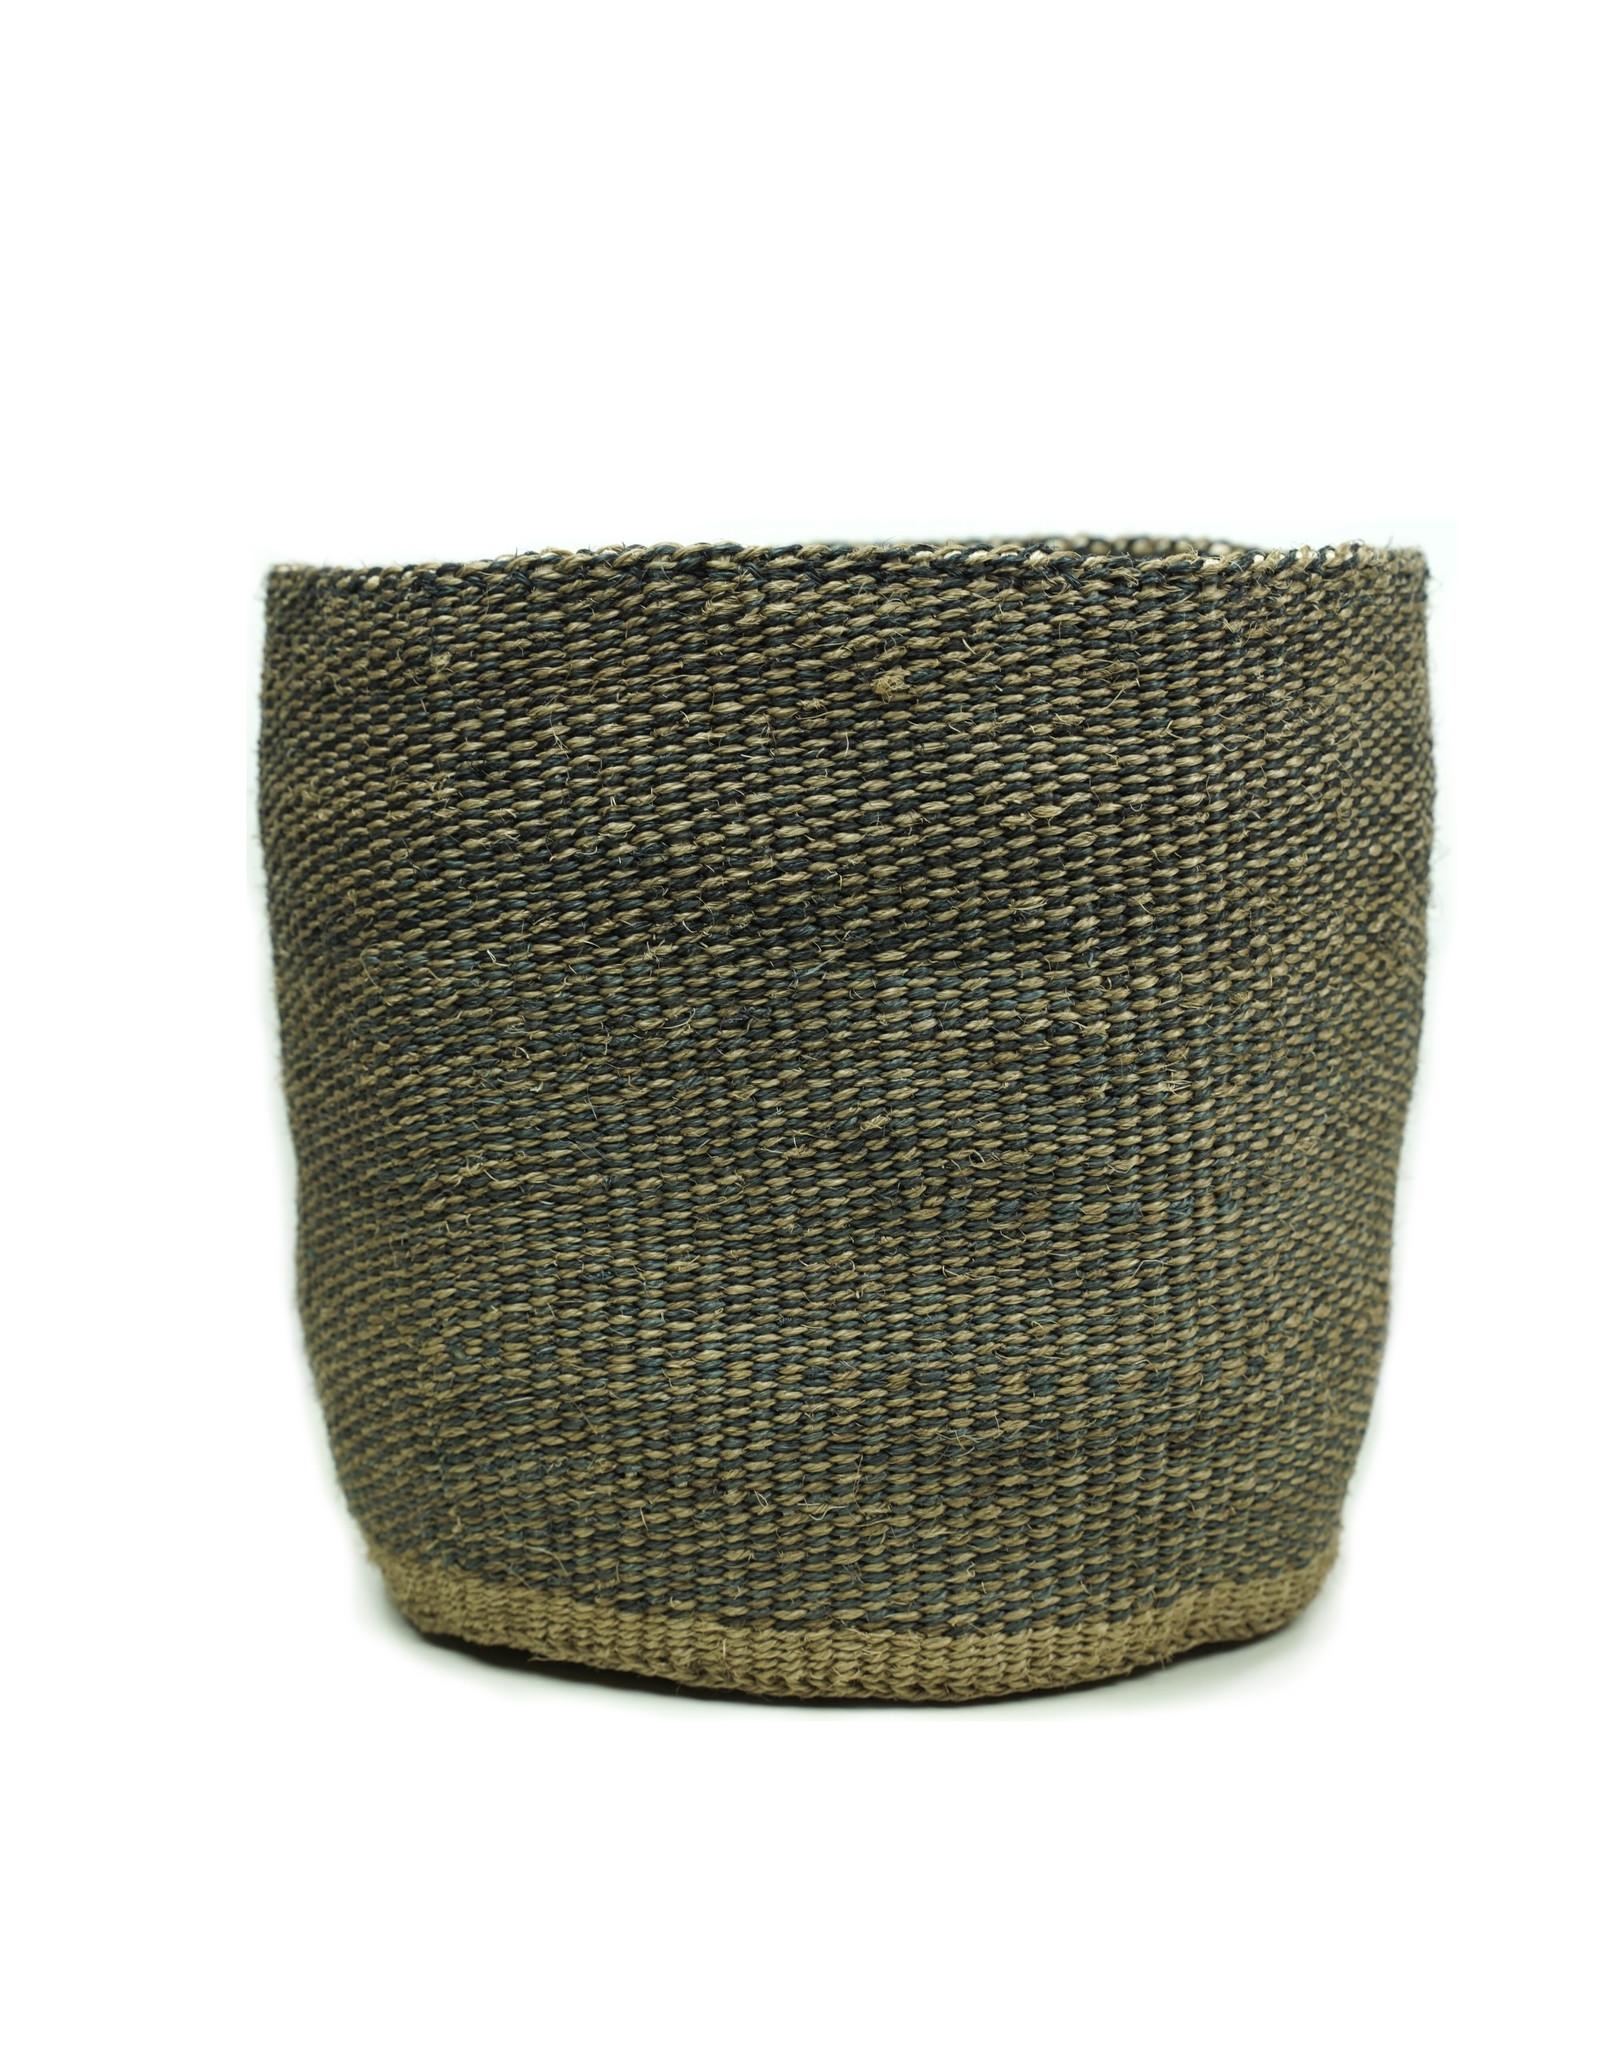 Maisha.Style Taita basket - dark tones - M/L4